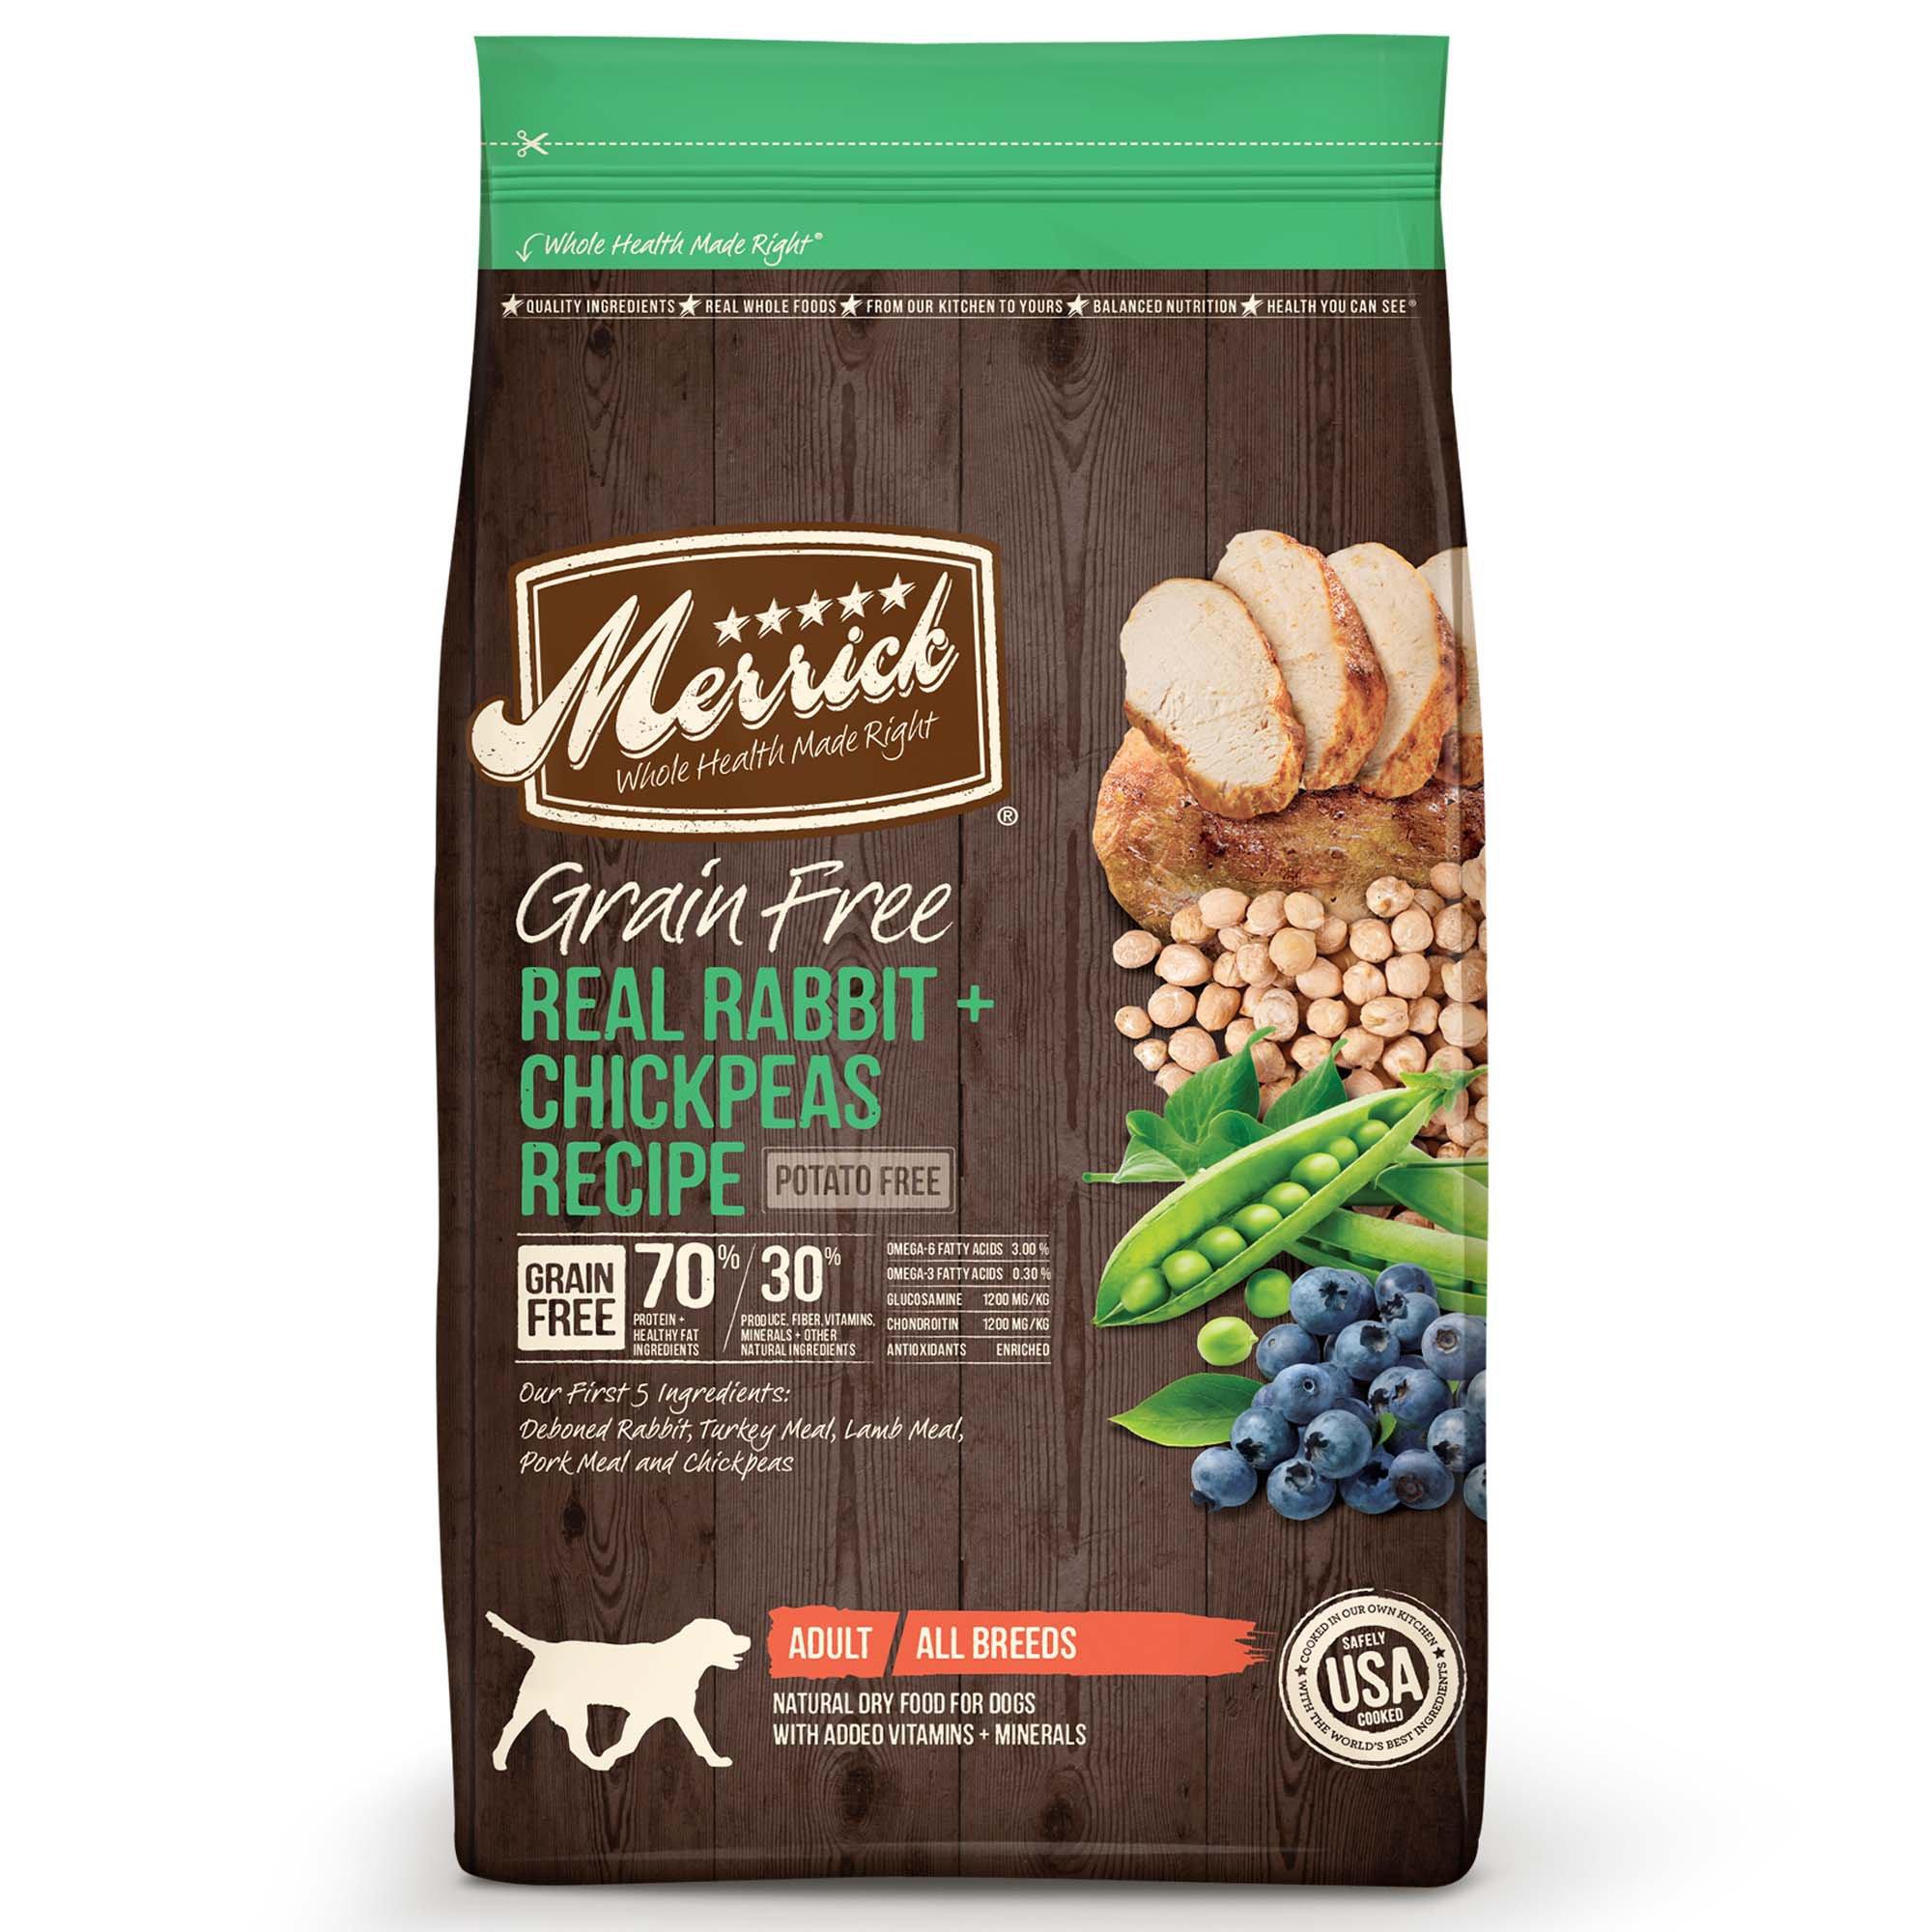 Merrick Grain Free Real Rabbit Chickpeas Dry Dog Food Petco